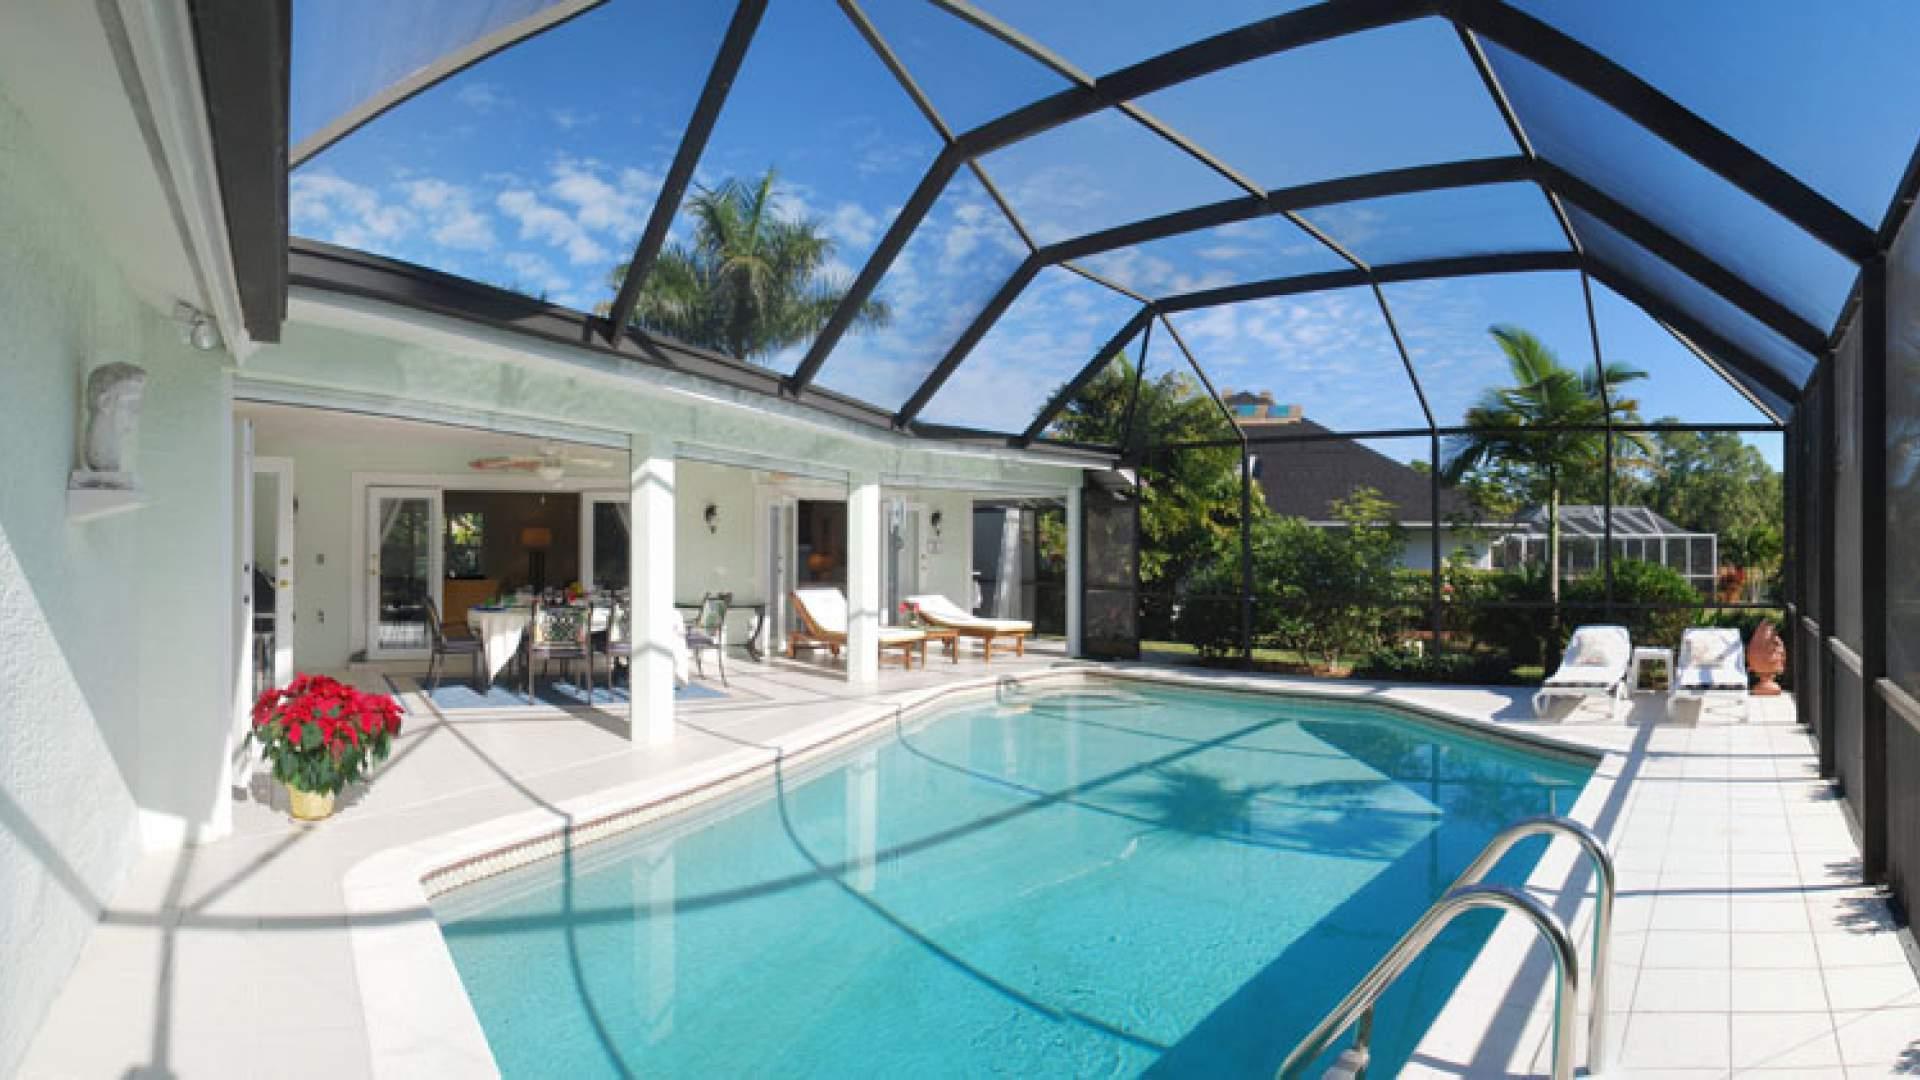 ferienhaus kings lake in naples florida. Black Bedroom Furniture Sets. Home Design Ideas